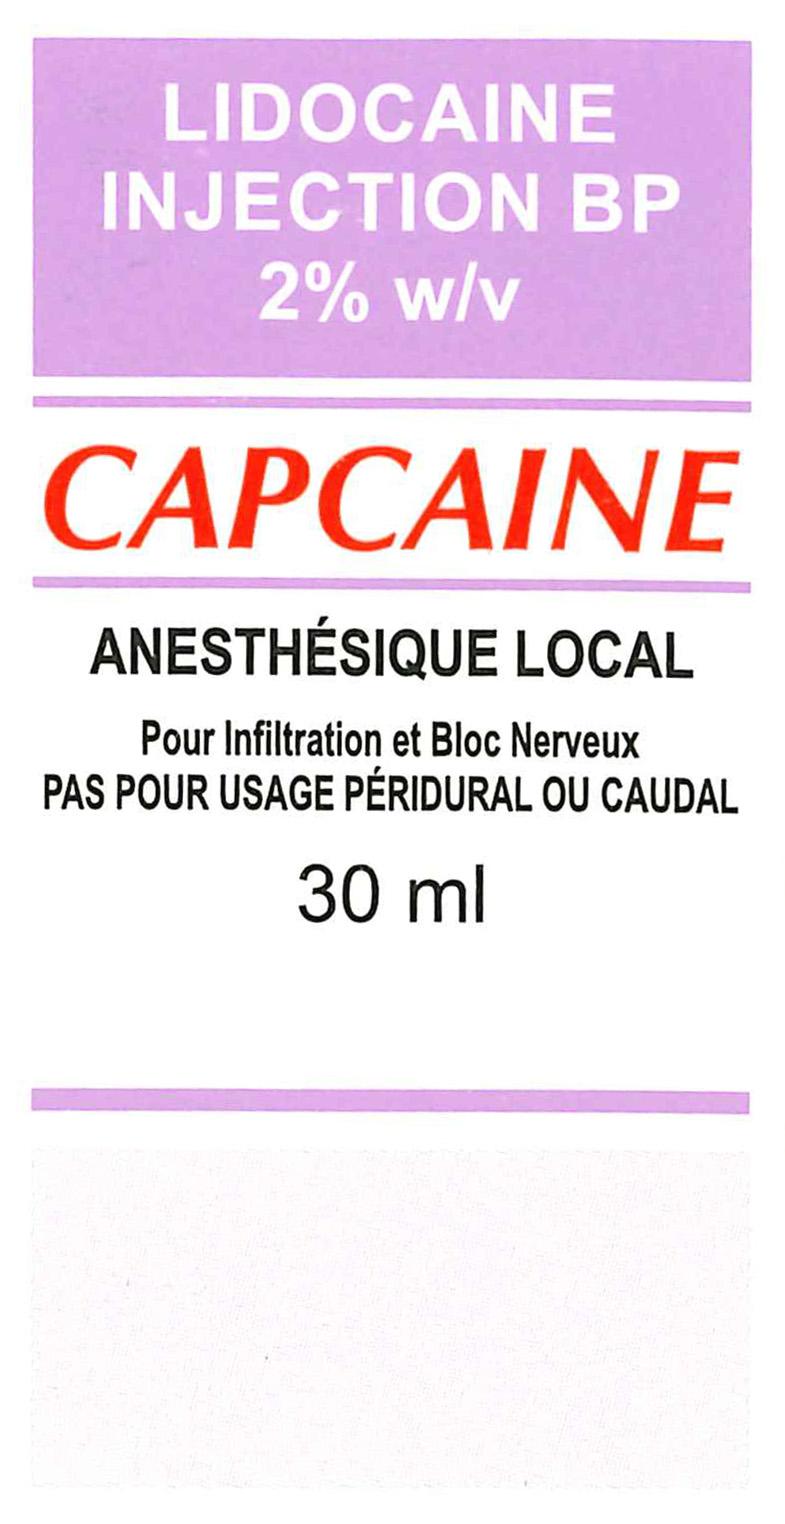 CAPCAINE Injectable